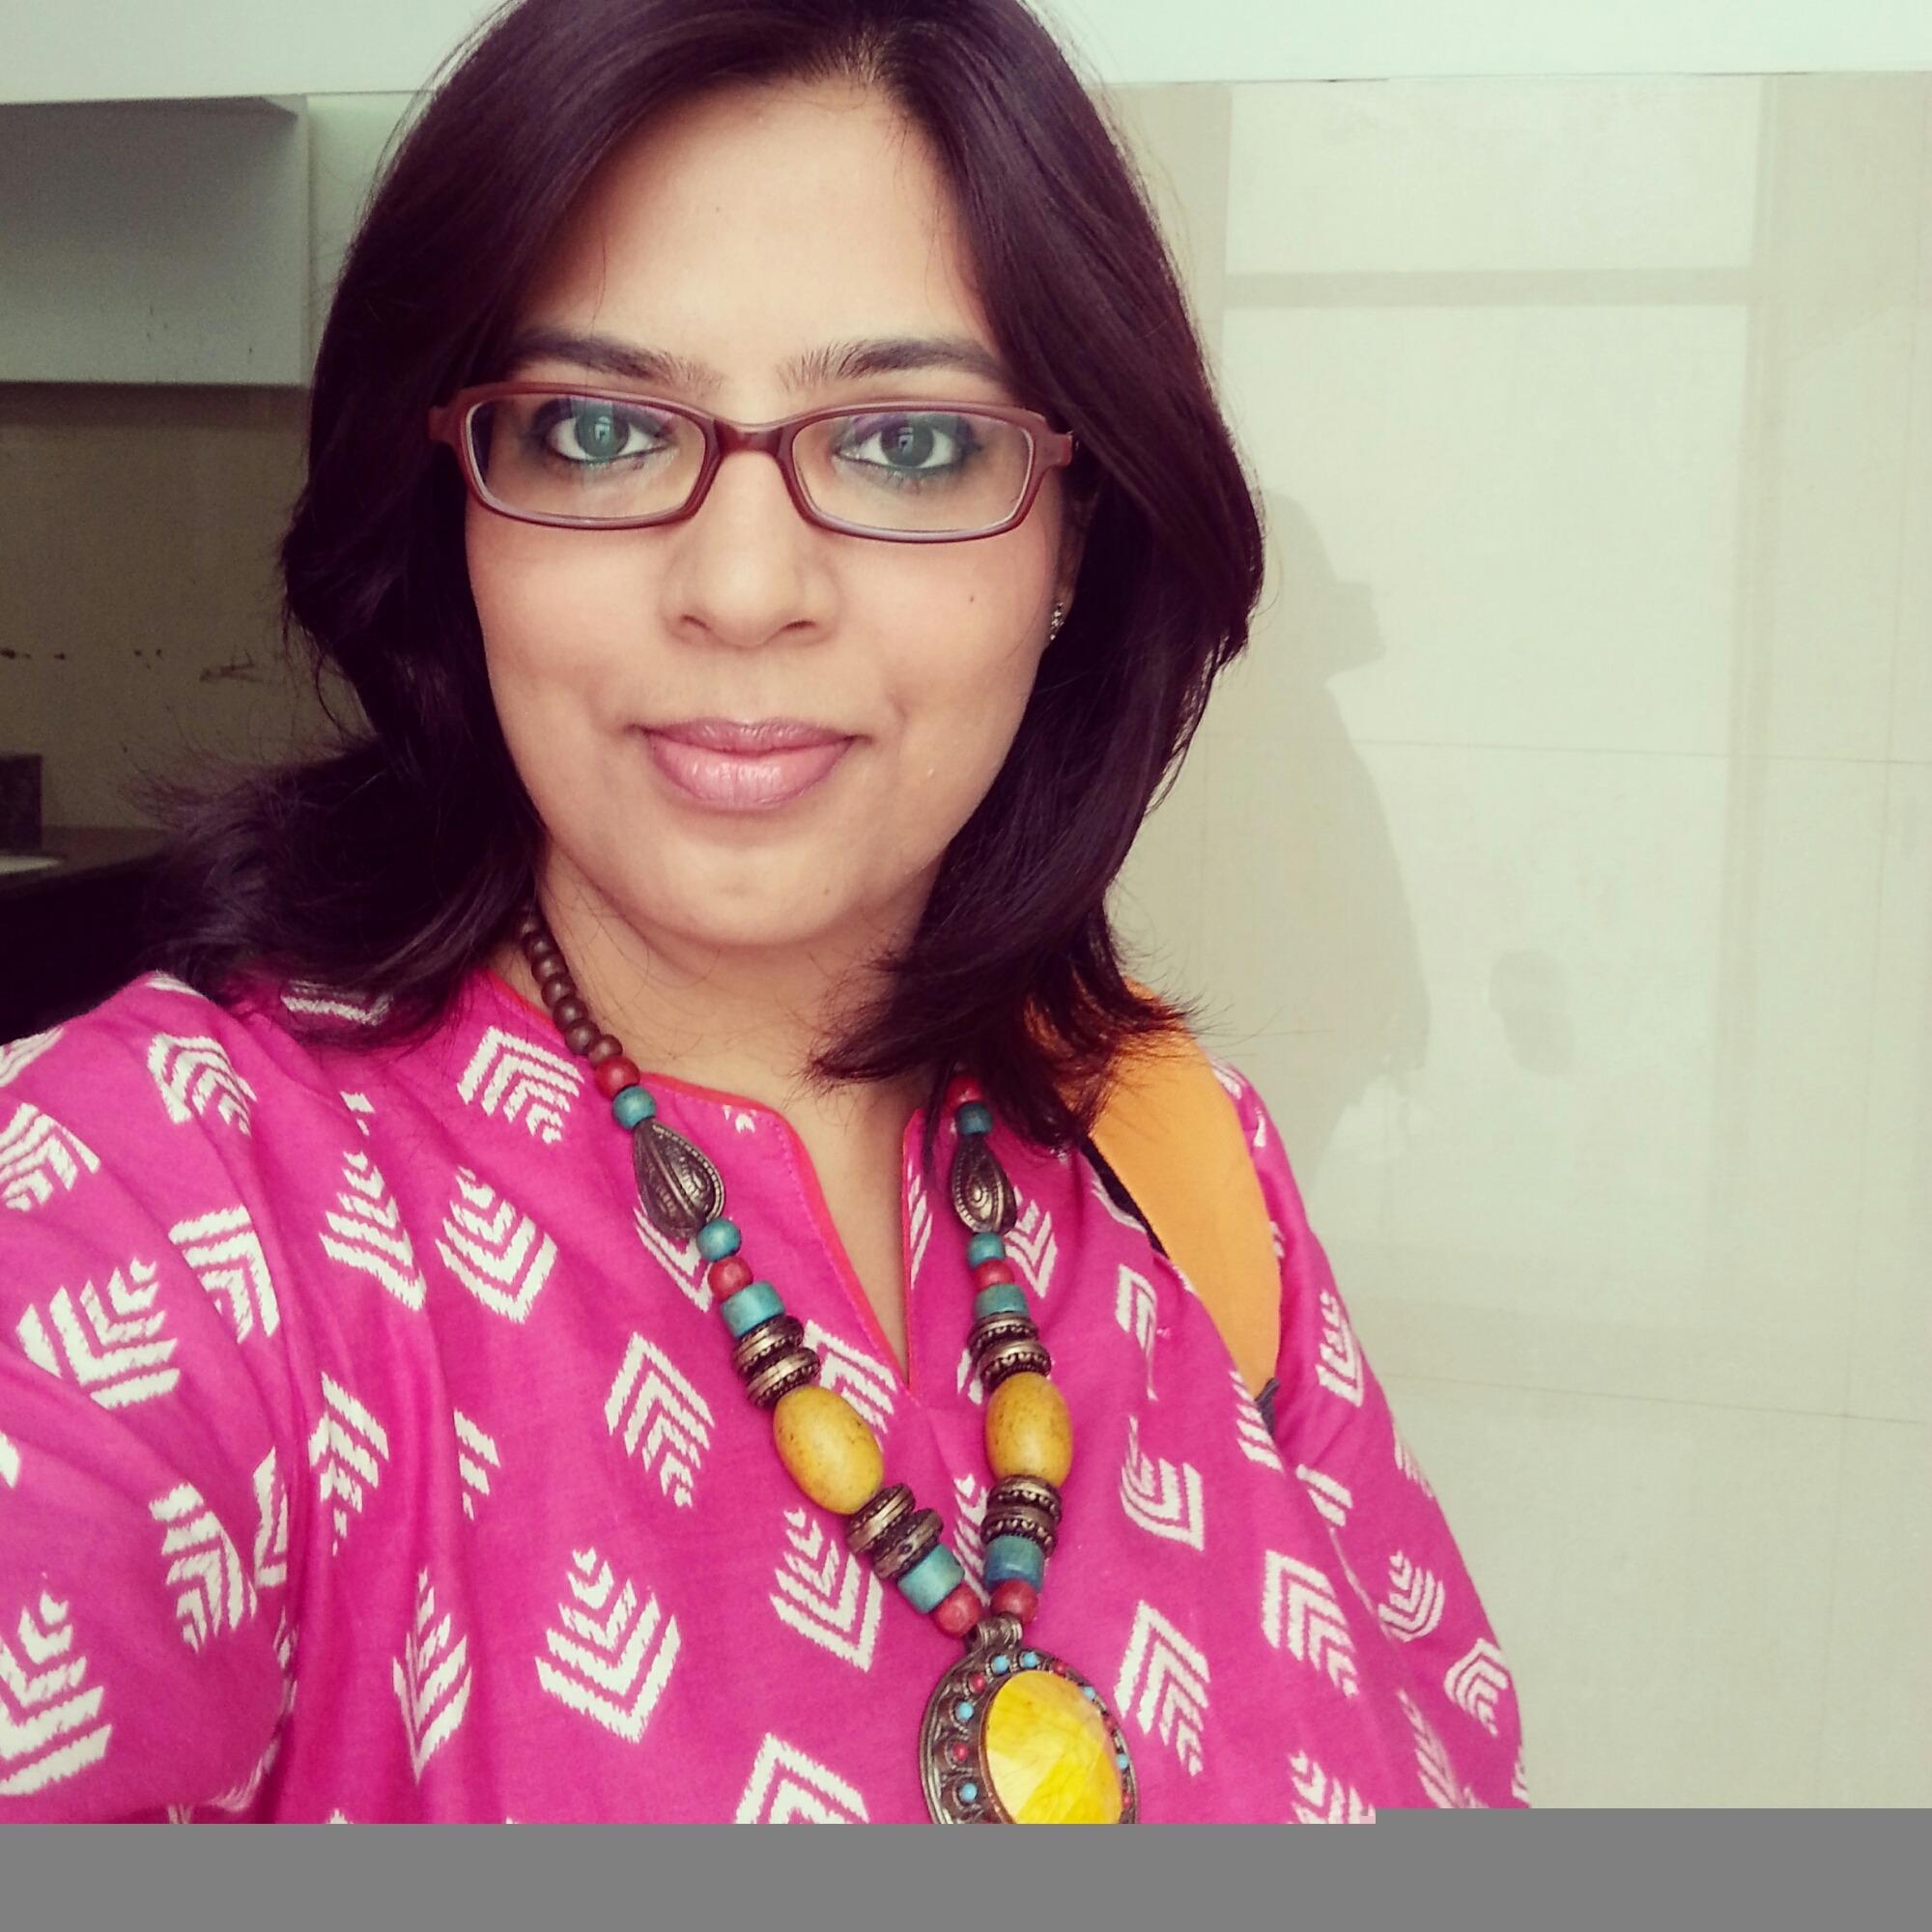 #MicroblogMondays : Statement Necklaces